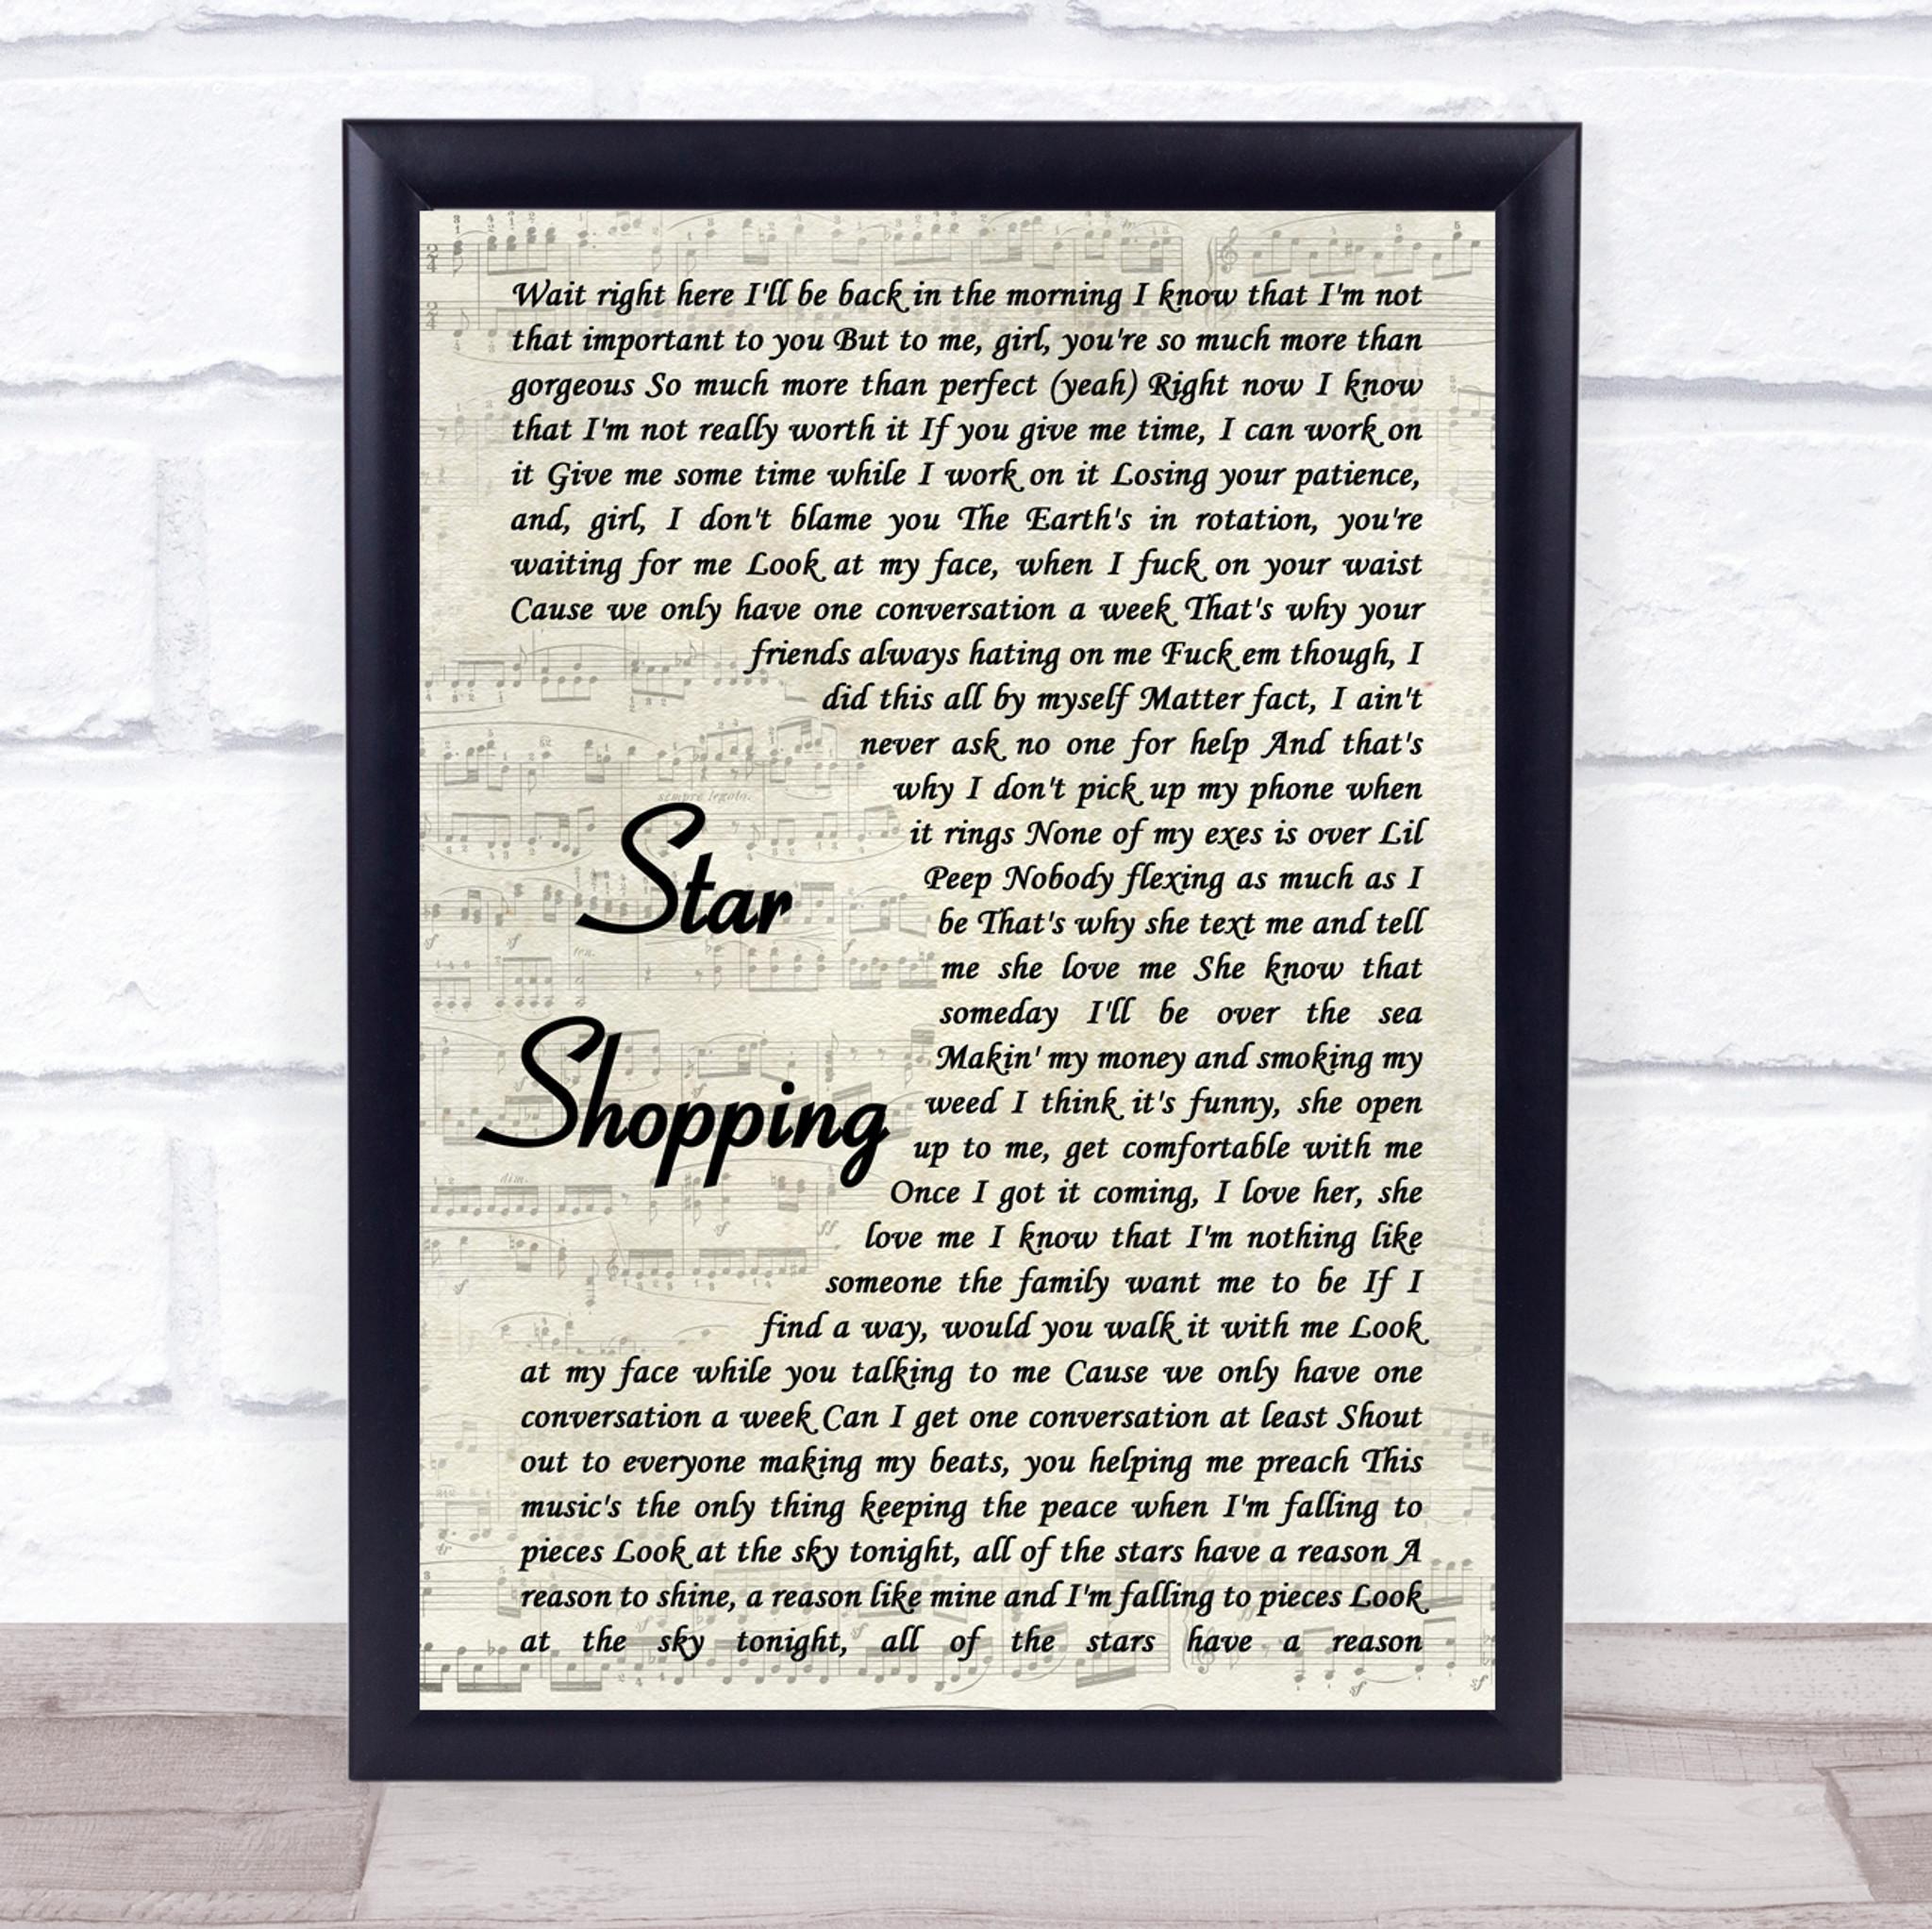 lil peep star shopping vintage script song lyric music gift poster print